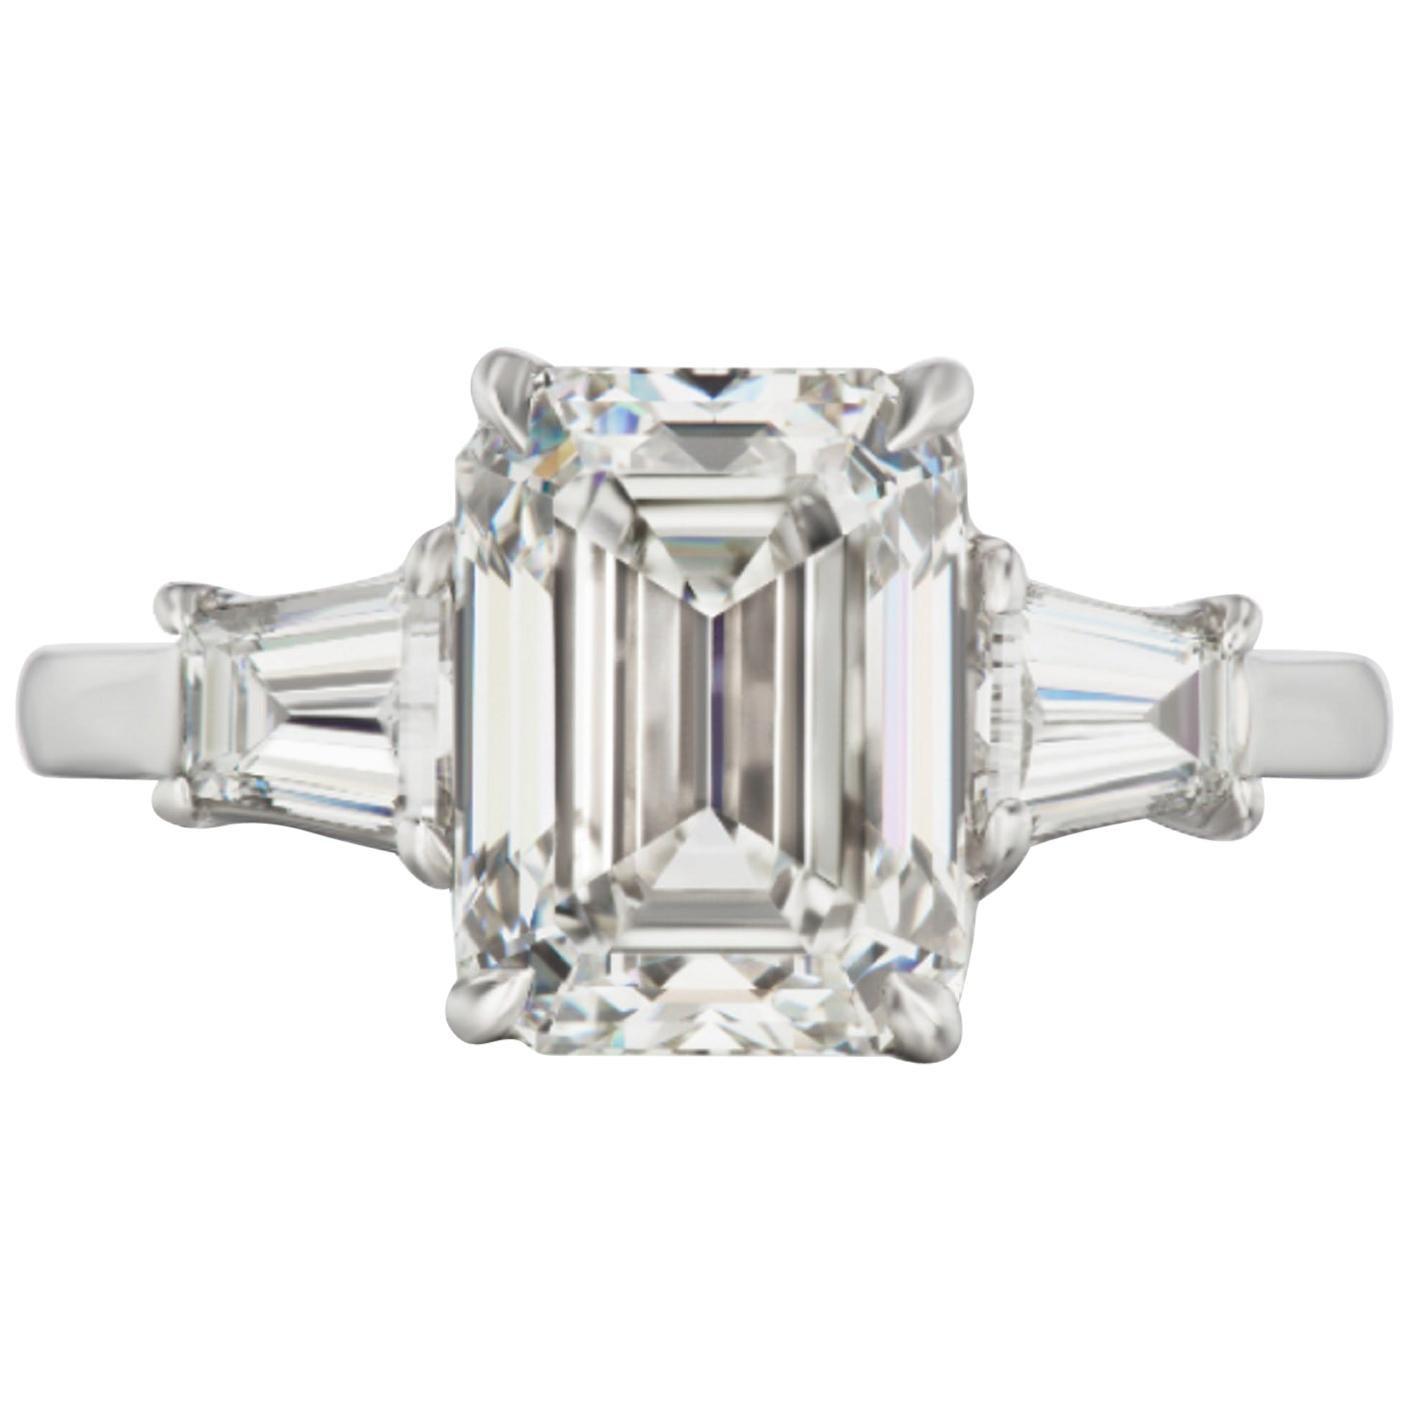 IGI ANTWERP 3 Carat Emerald Cut Diamond Ring